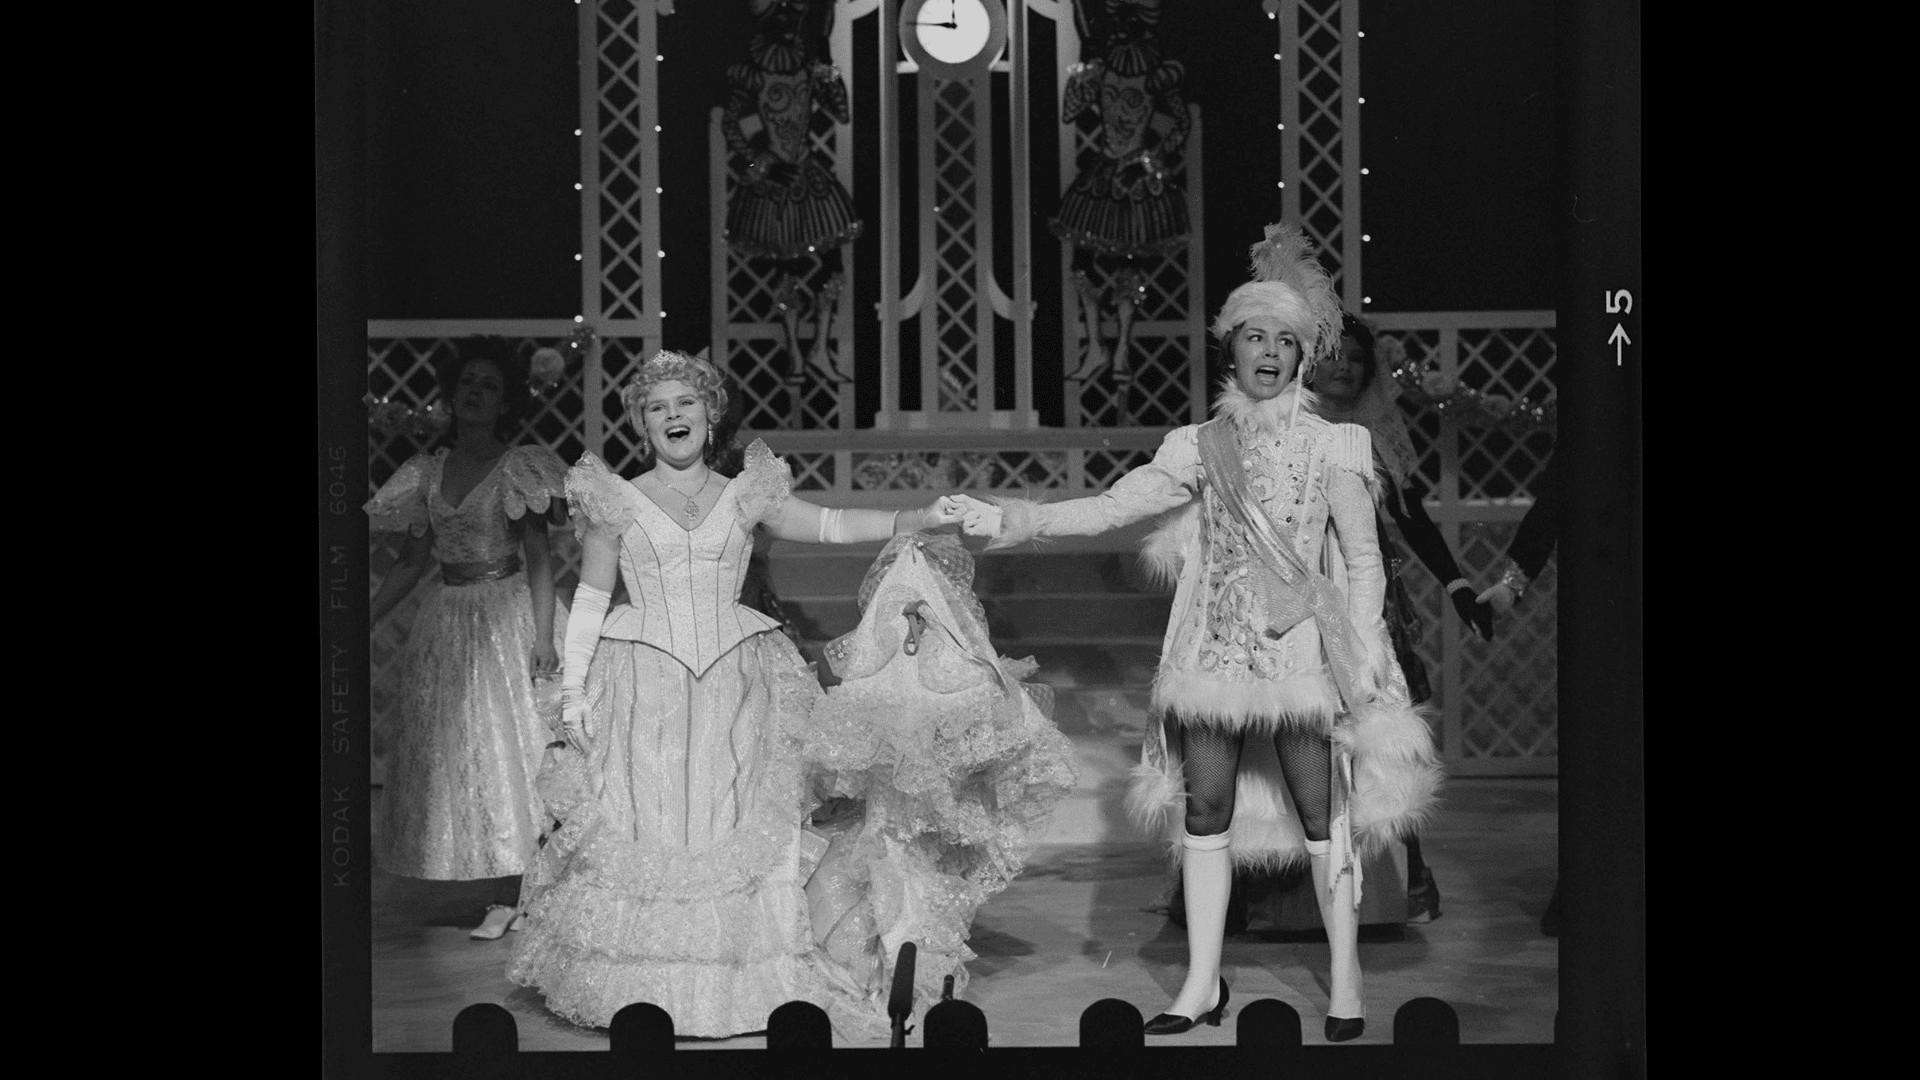 Imelda Staunton in Cinderella 20 Dec 1978